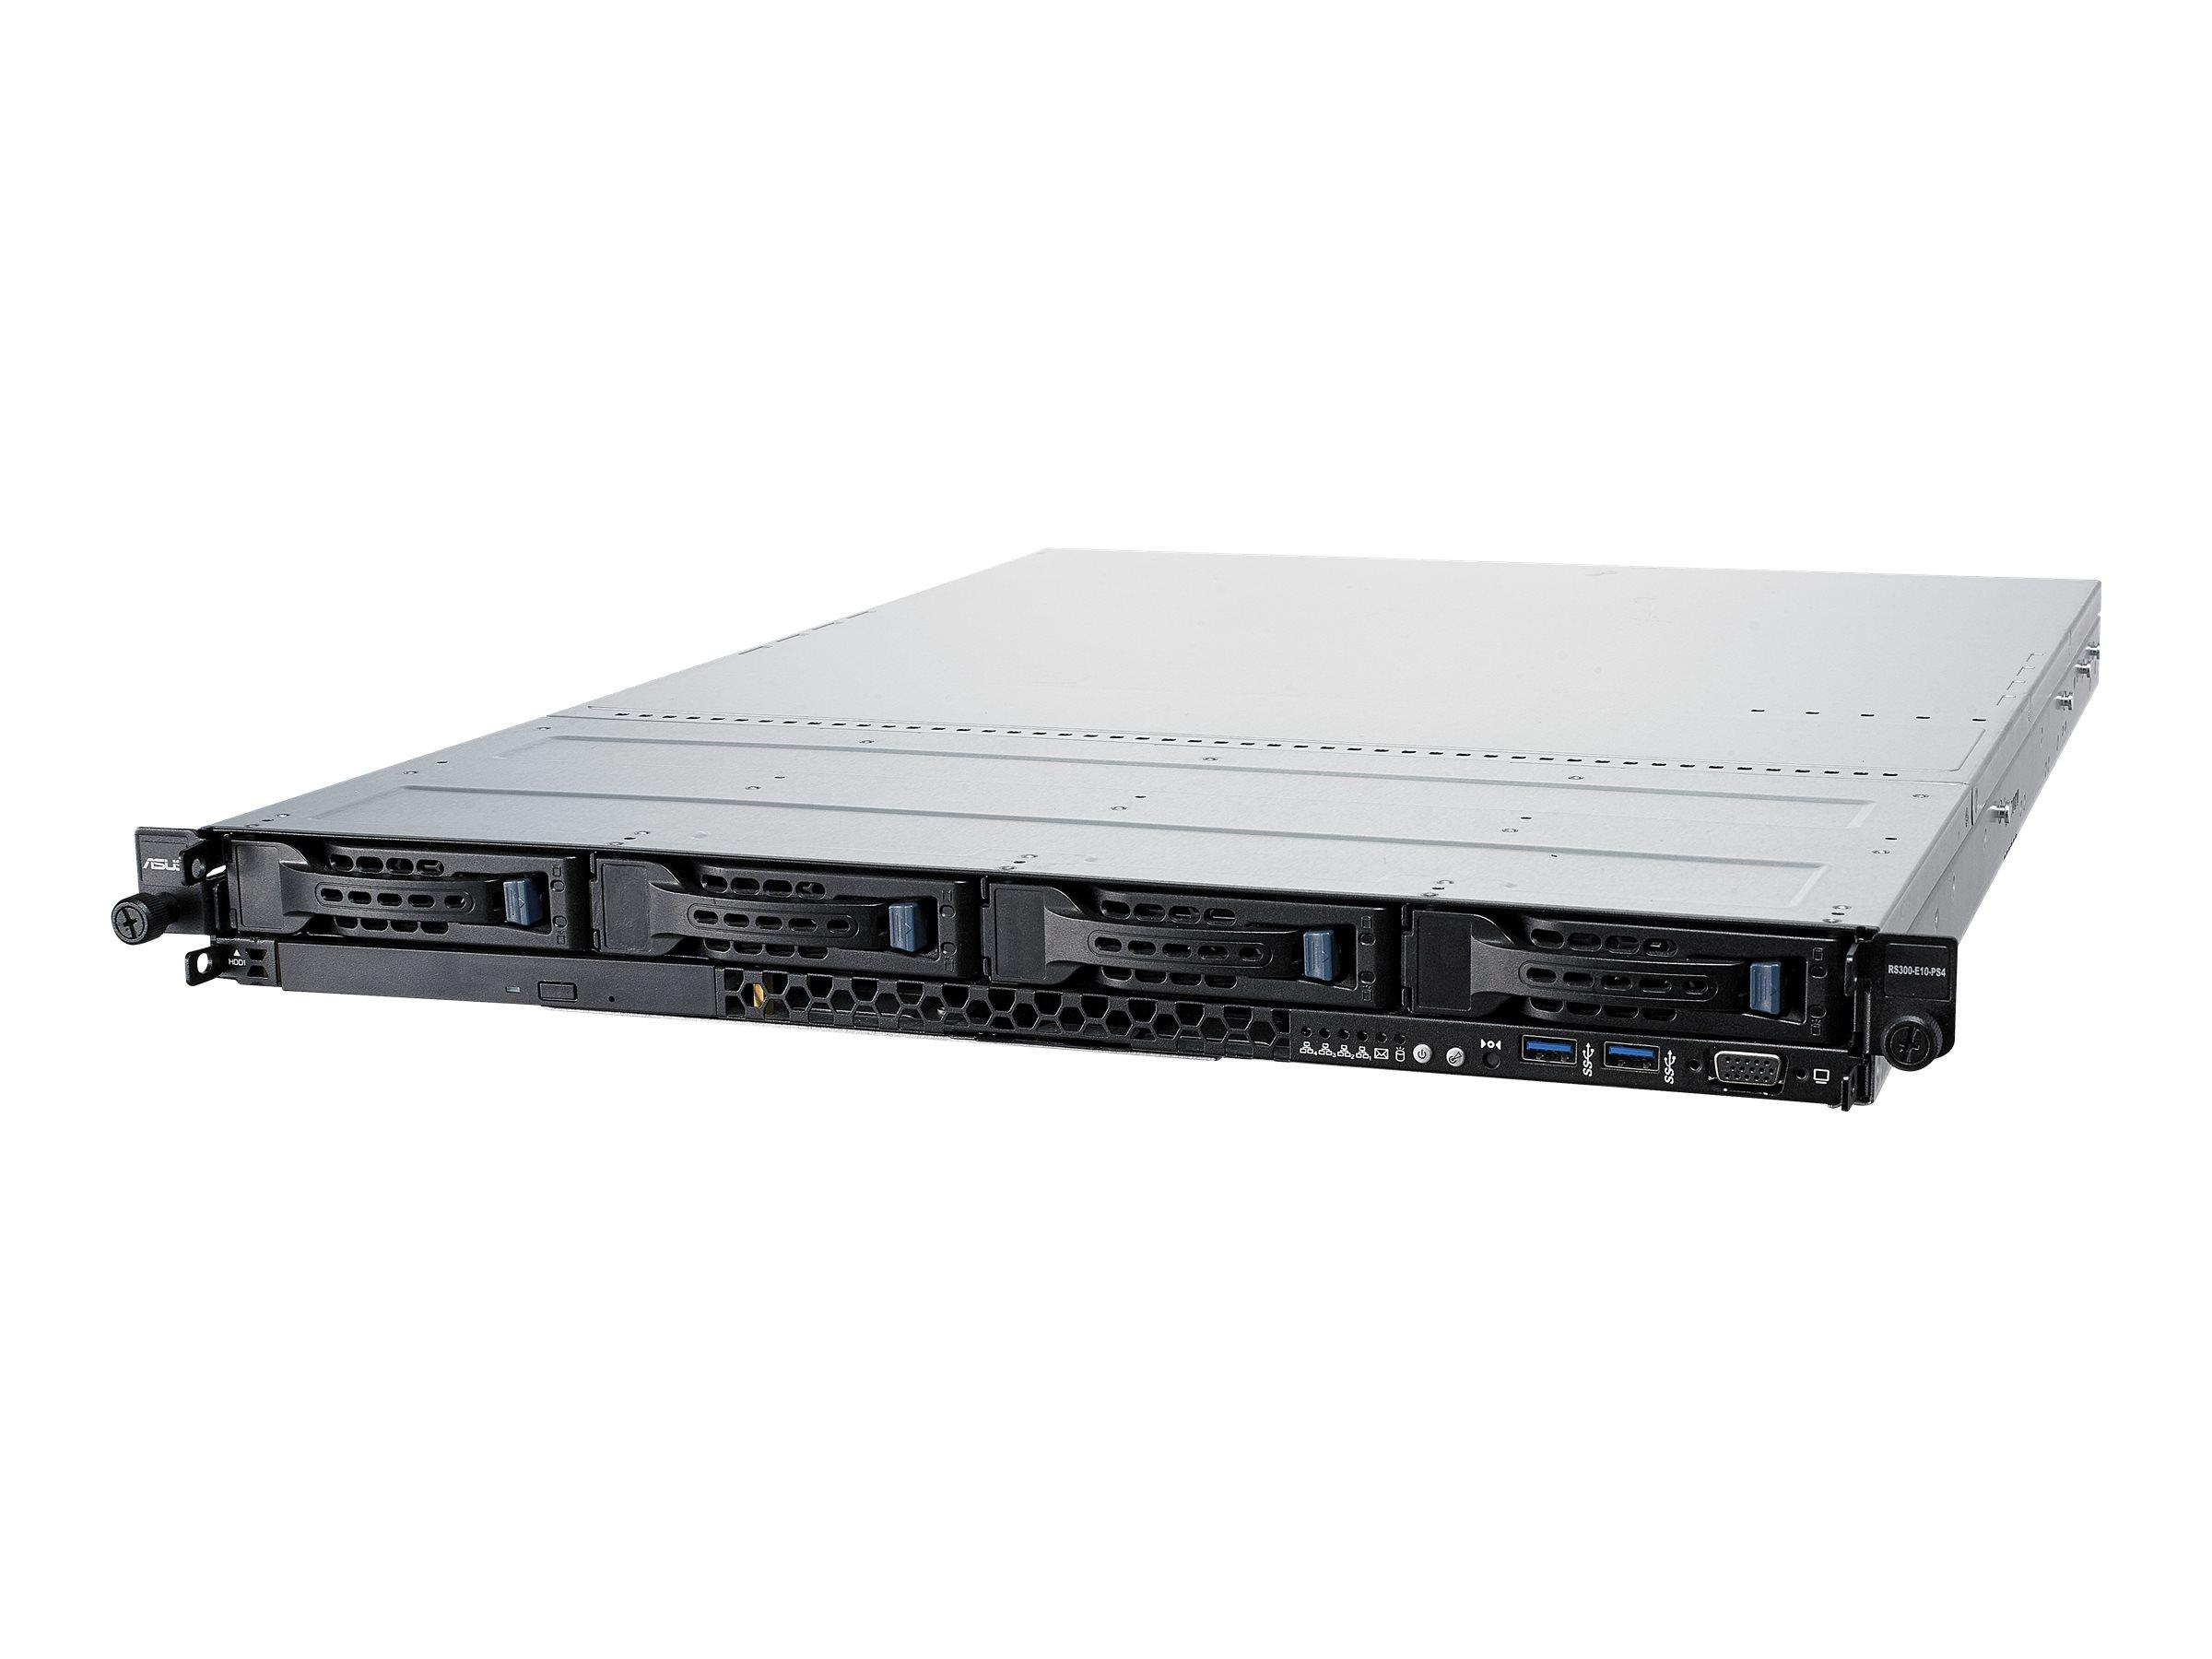 "ASUS RS300-E10-PS4 - Server - Rack-Montage - 1U - 1-Weg - keine CPU - RAM 0 GB - SATA - Hot-Swap 8.9 cm (3.5"")"